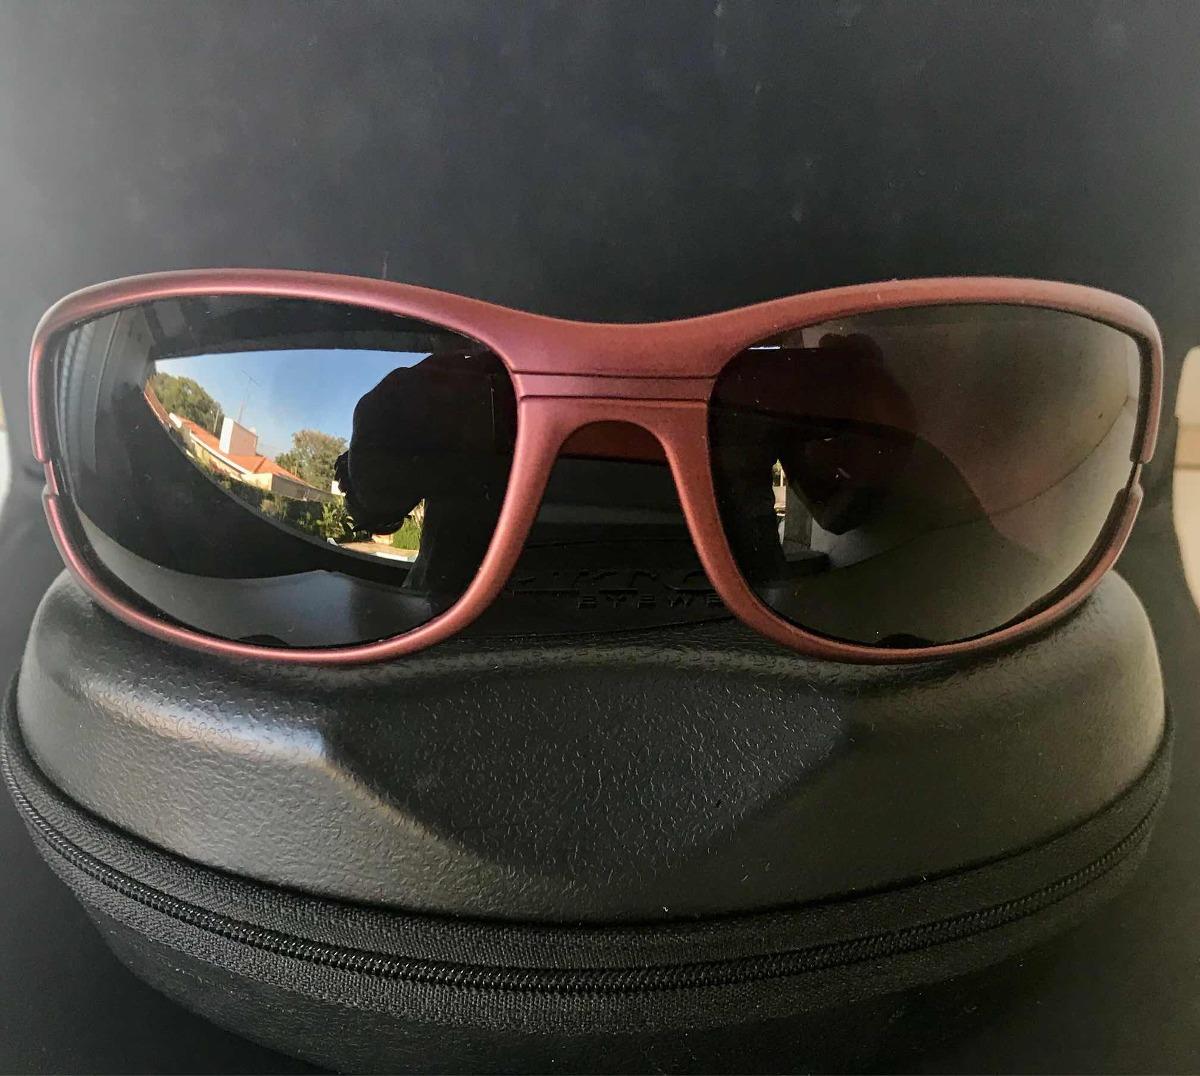 8eea1740b Óculos De Sol Triton Original - N É Oakley - R$ 50,00 em Mercado Livre